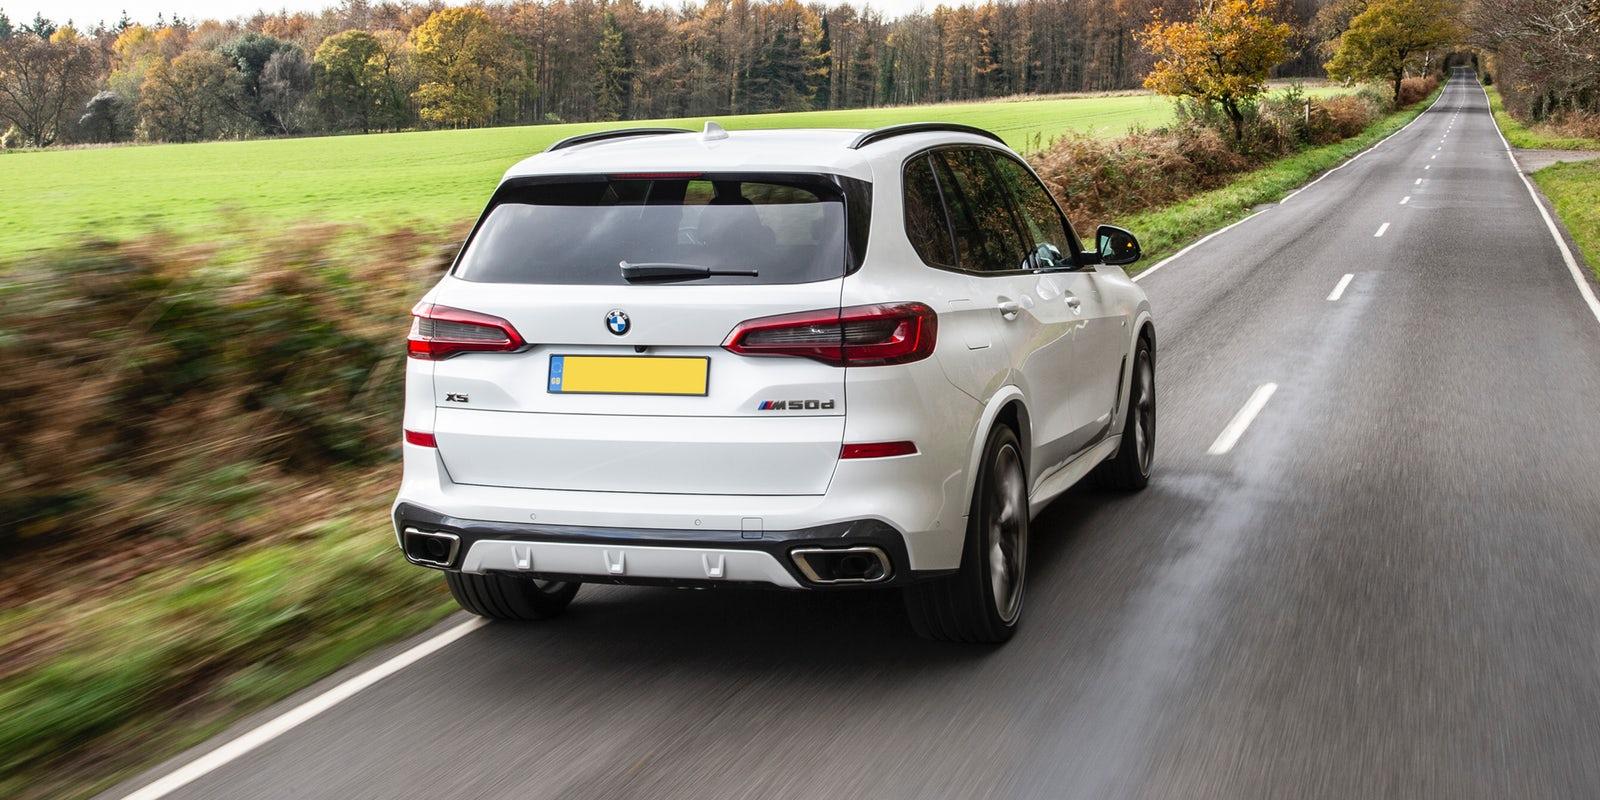 bmw-x5-rear